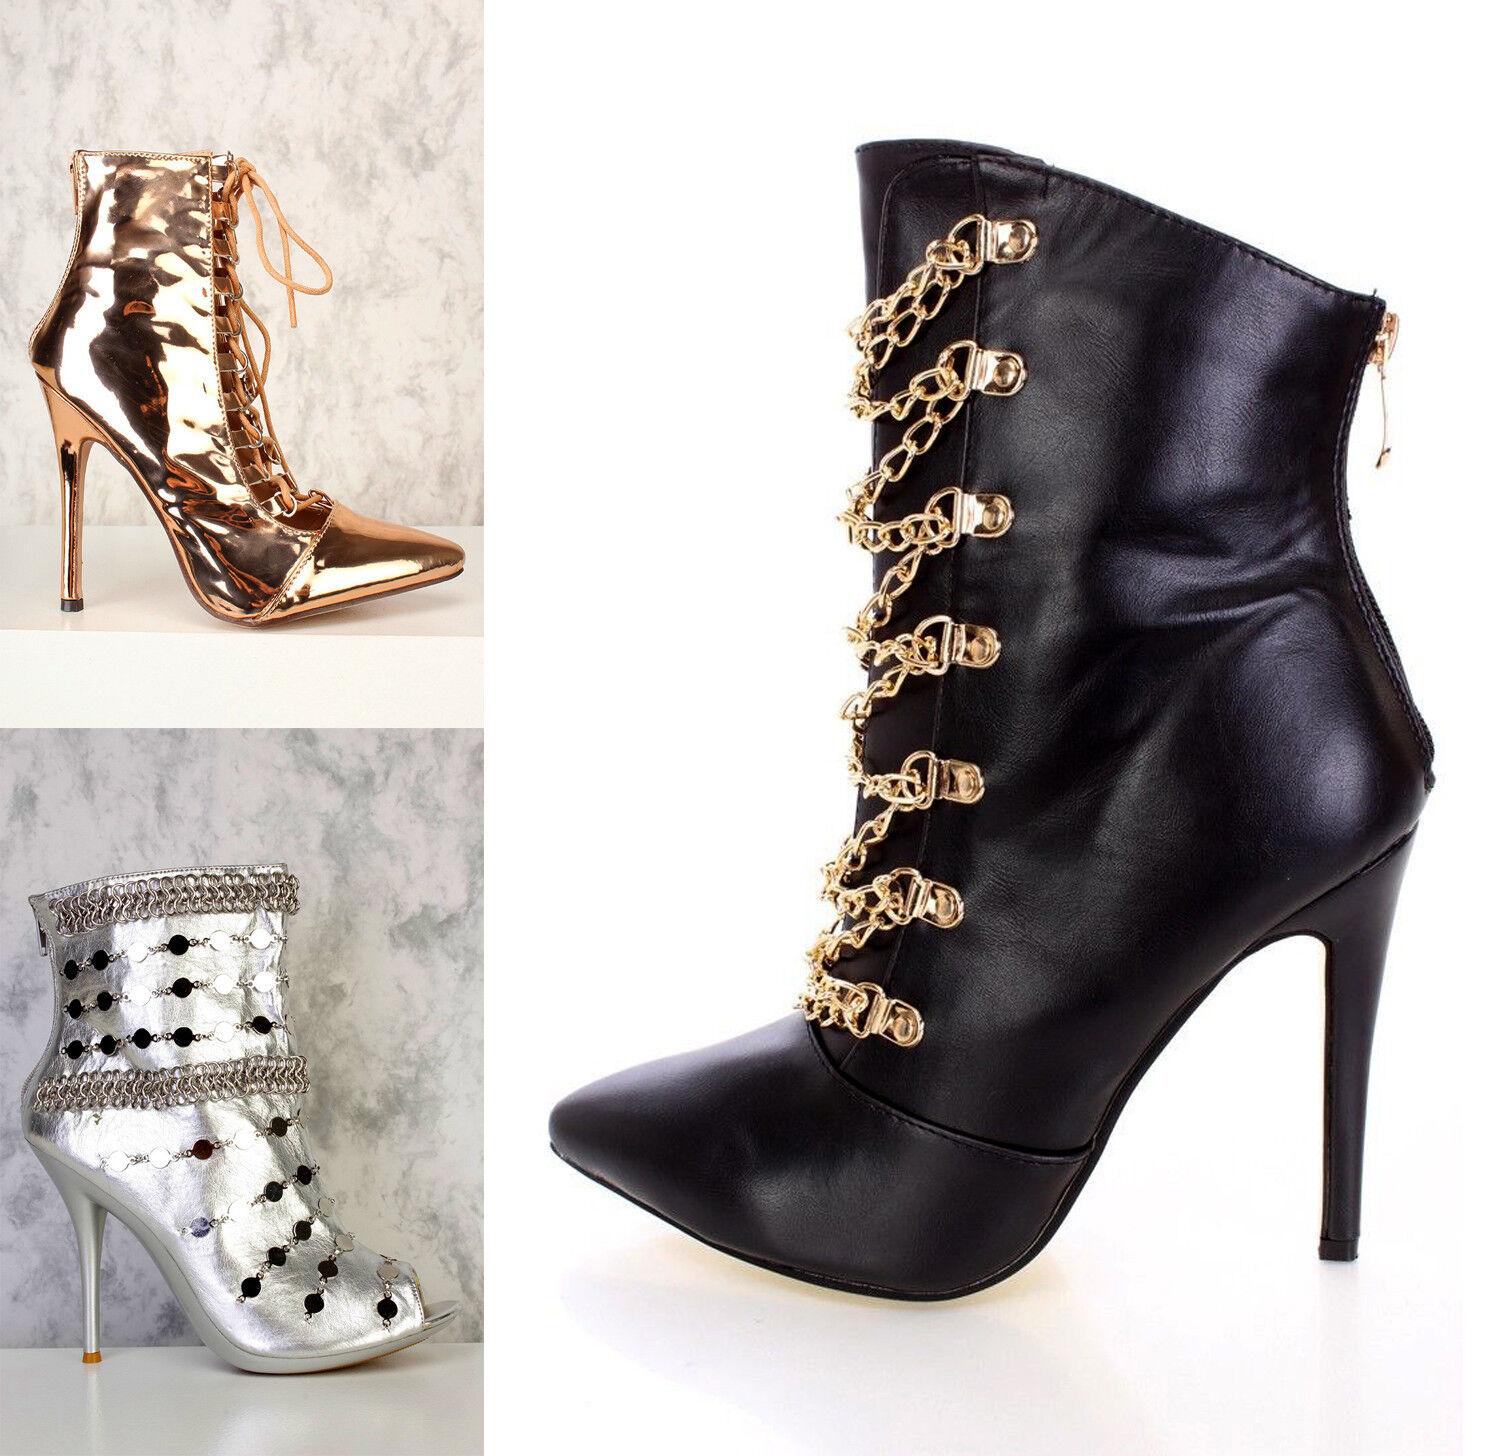 BLACK gold Silver SINGLE SOLE BOOTIES Peep Toe FAUX LEATHER Stilleto High Heels